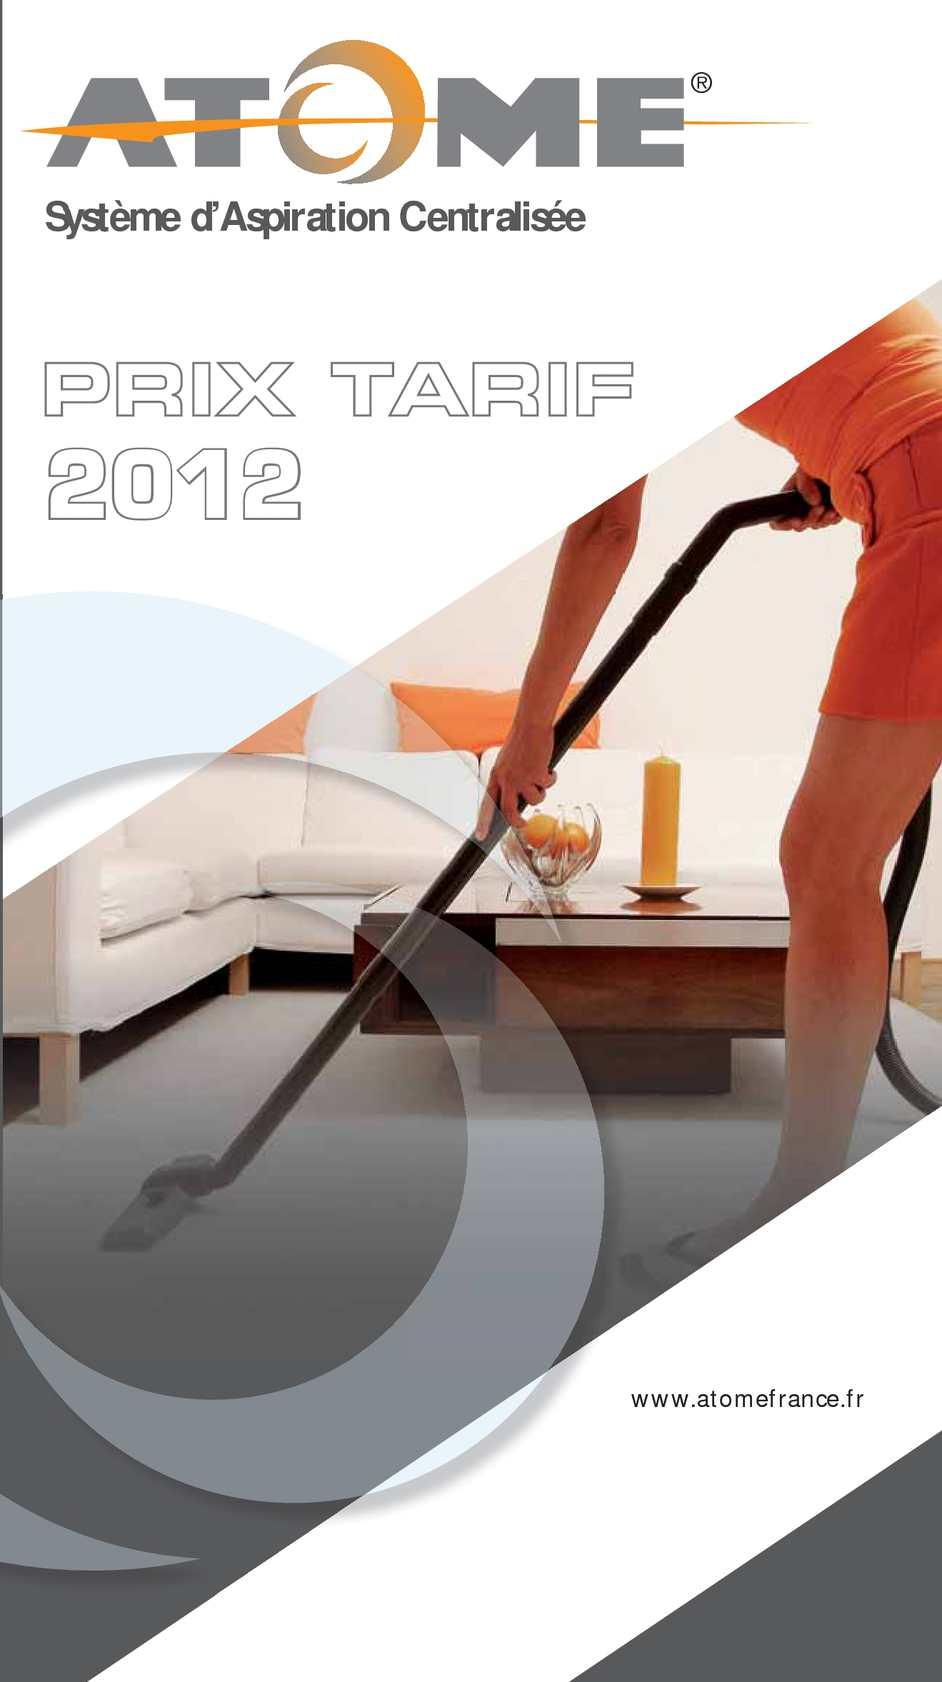 calam o tarif atome 2012 aspiration centralis e. Black Bedroom Furniture Sets. Home Design Ideas